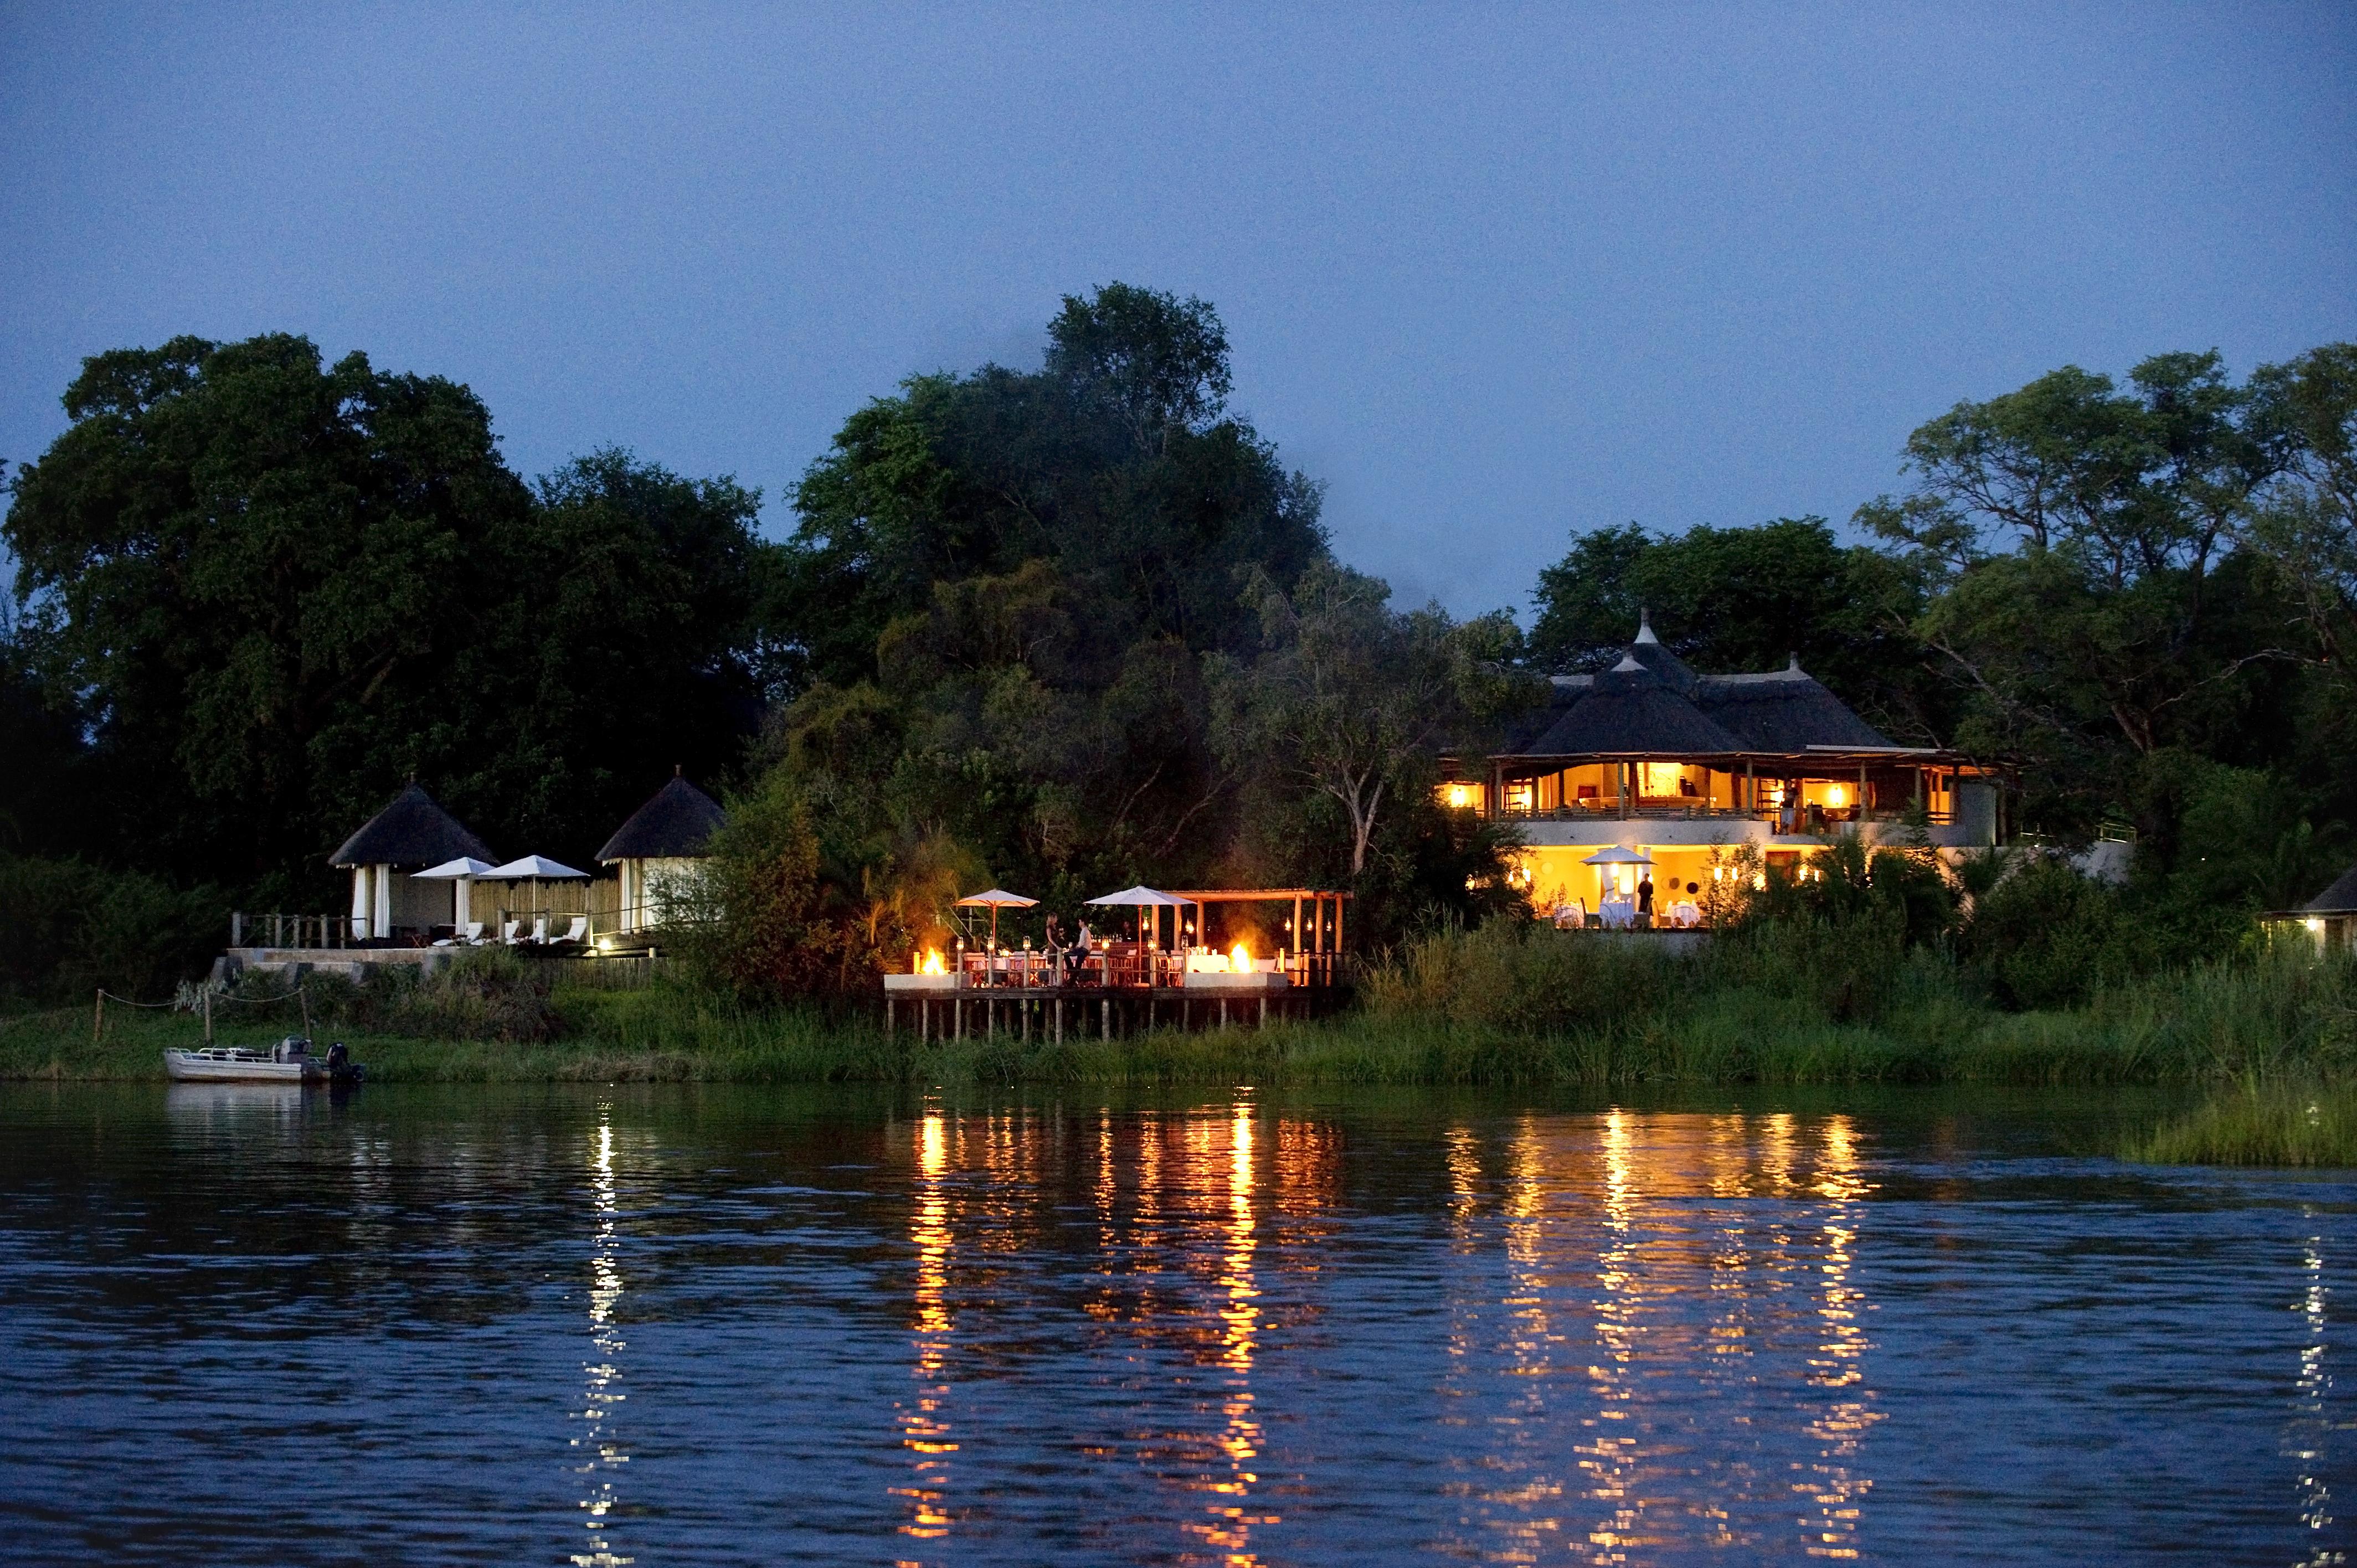 Sussi-and-chuma-zambia-exterior